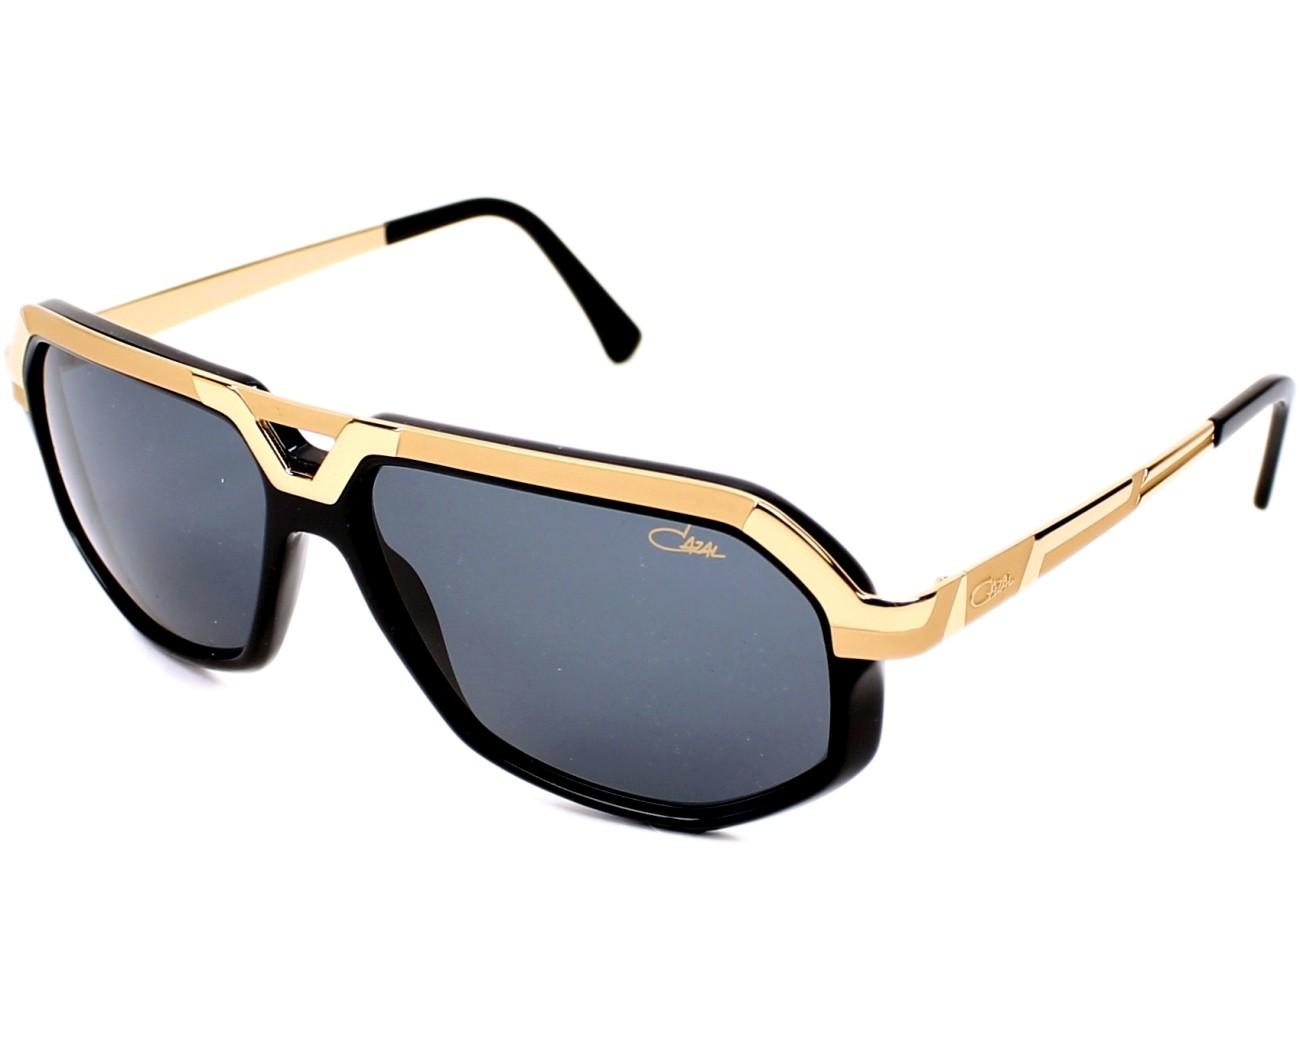 Cazal Sunglasses 8021 001 Black Visionet